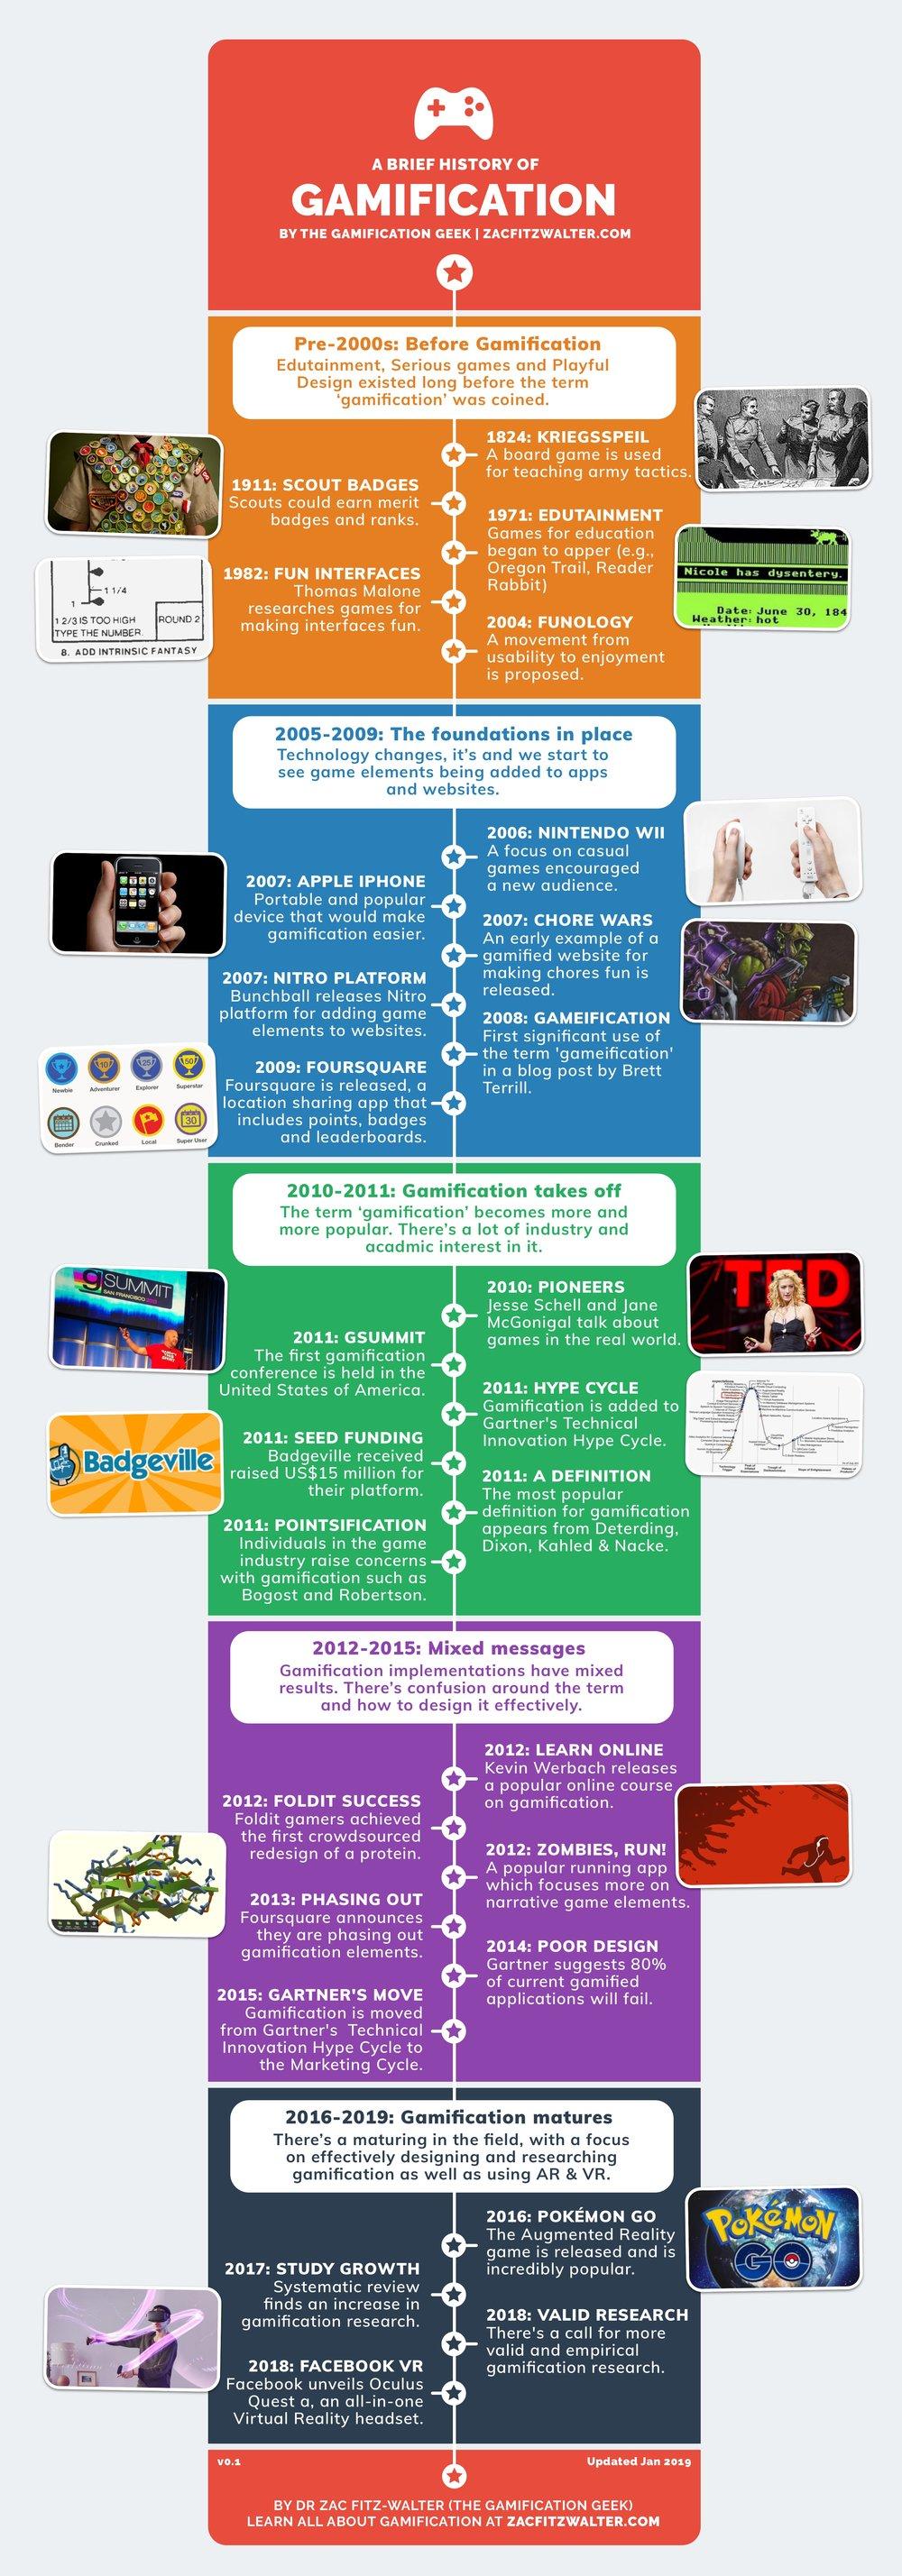 history-gamification-zac-fitzwalter.jpg